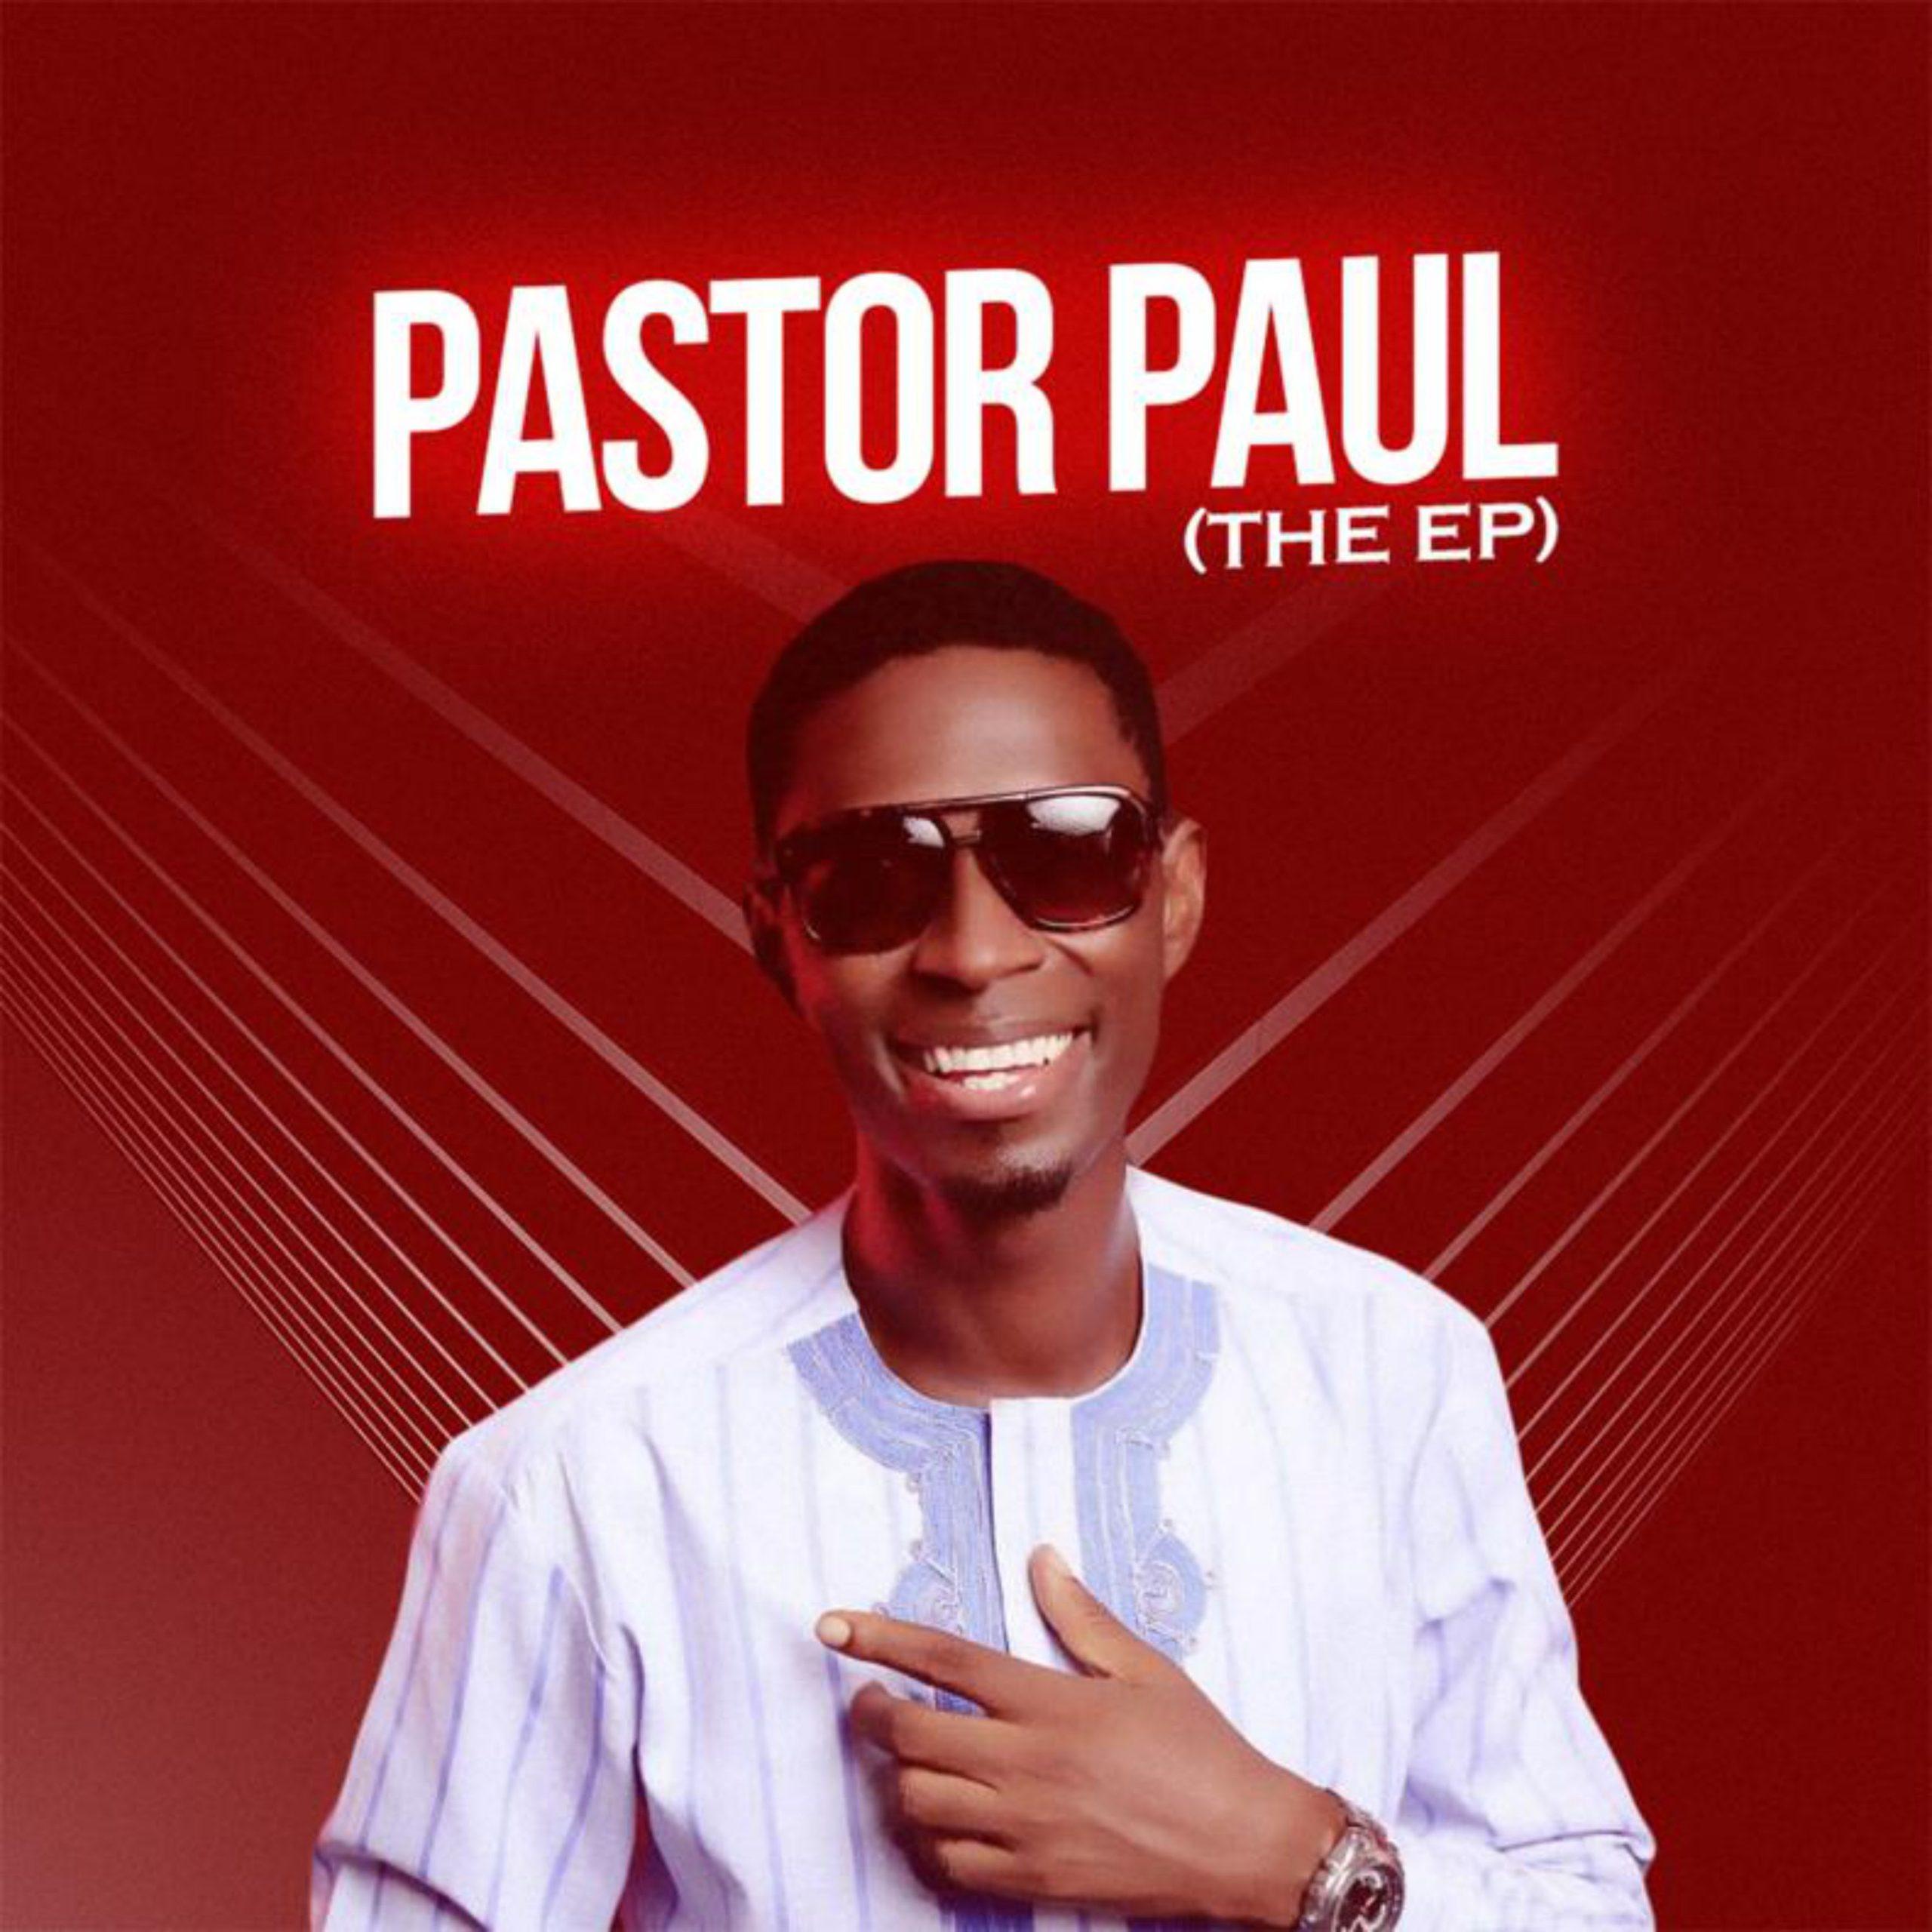 Pastor Paul - The EP [Mp3 + Album Download]